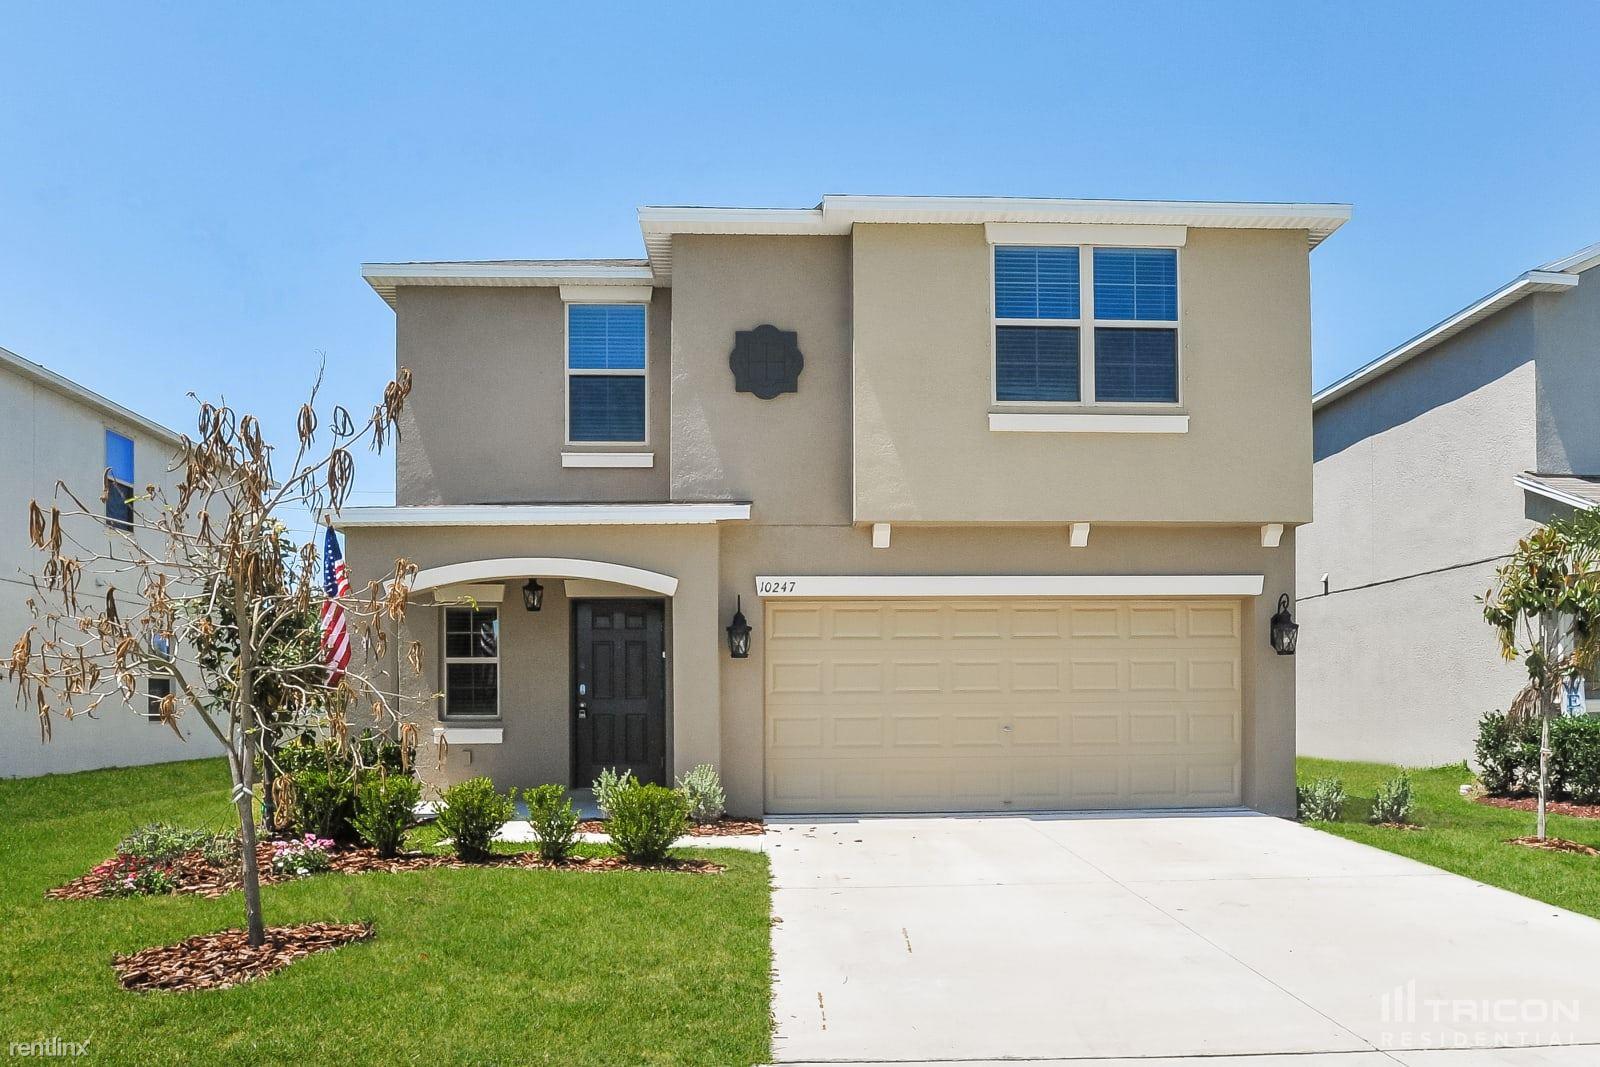 10247 Boggy Moss Drive, Riverview, FL - $2,299 USD/ month